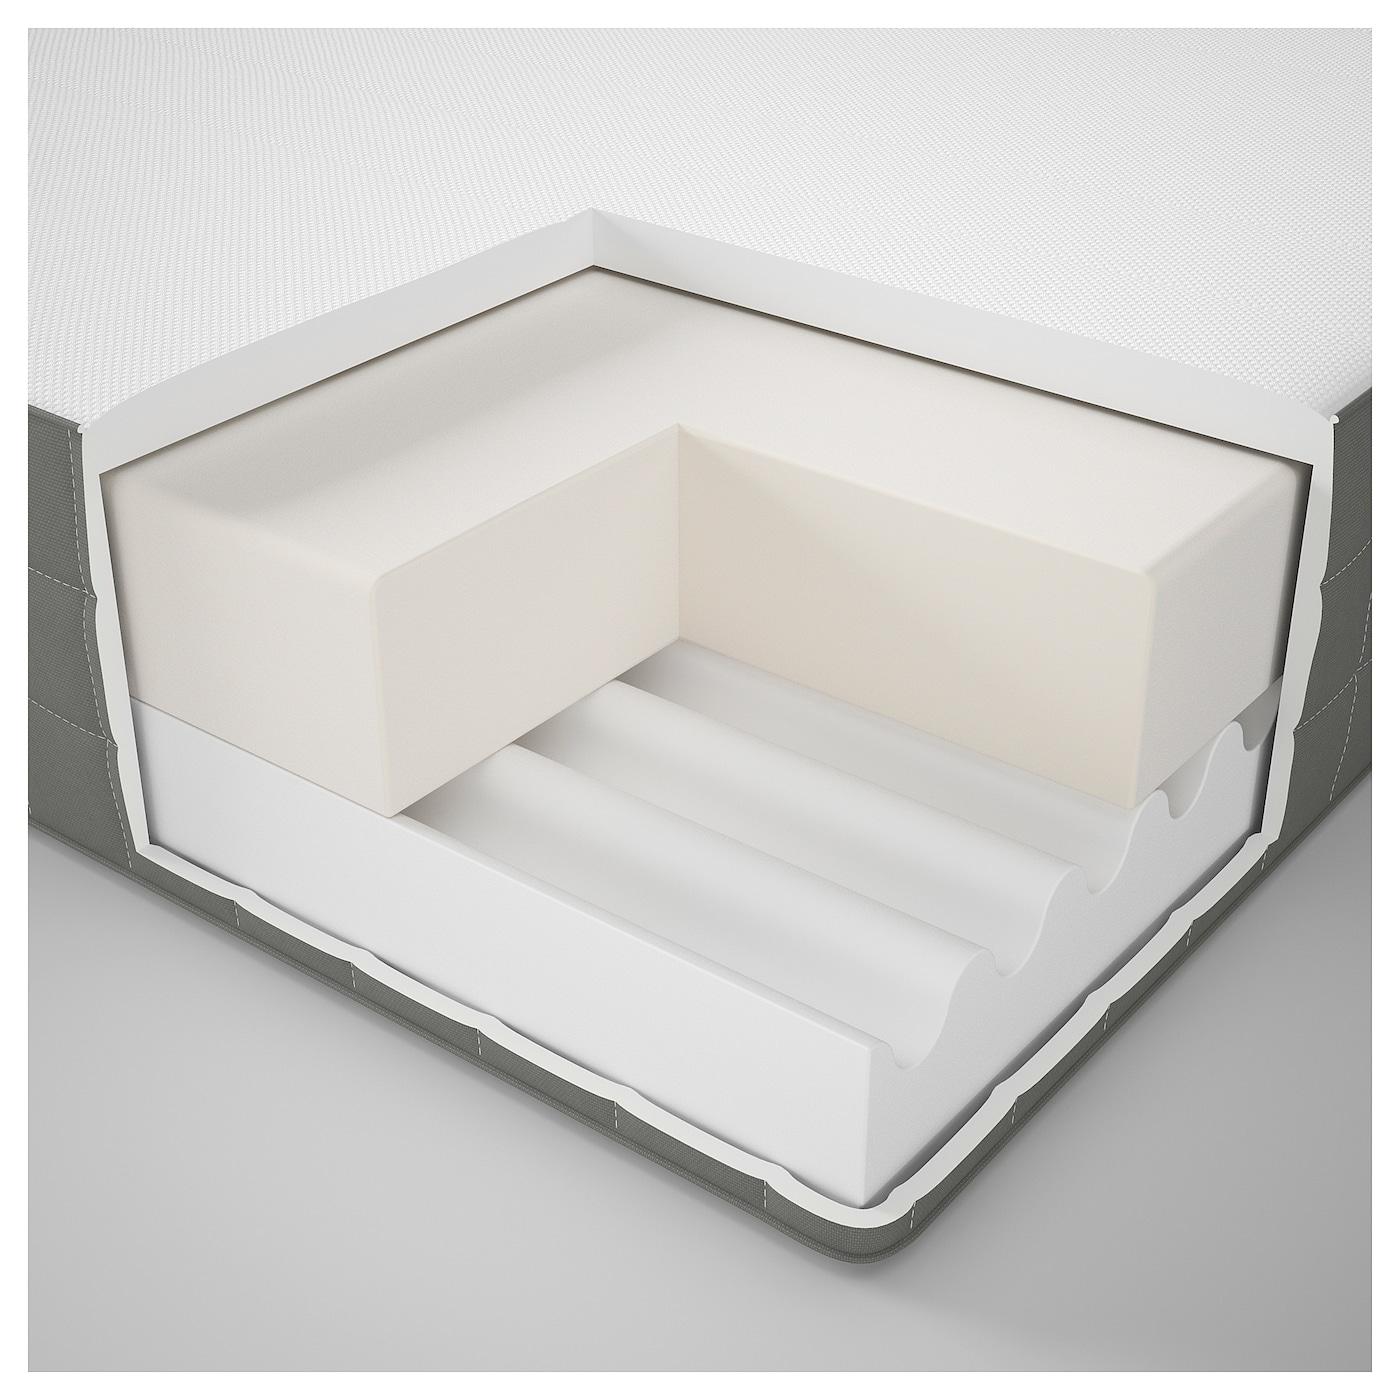 morgedal memory foam mattress medium firm dark grey standard double ikea. Black Bedroom Furniture Sets. Home Design Ideas